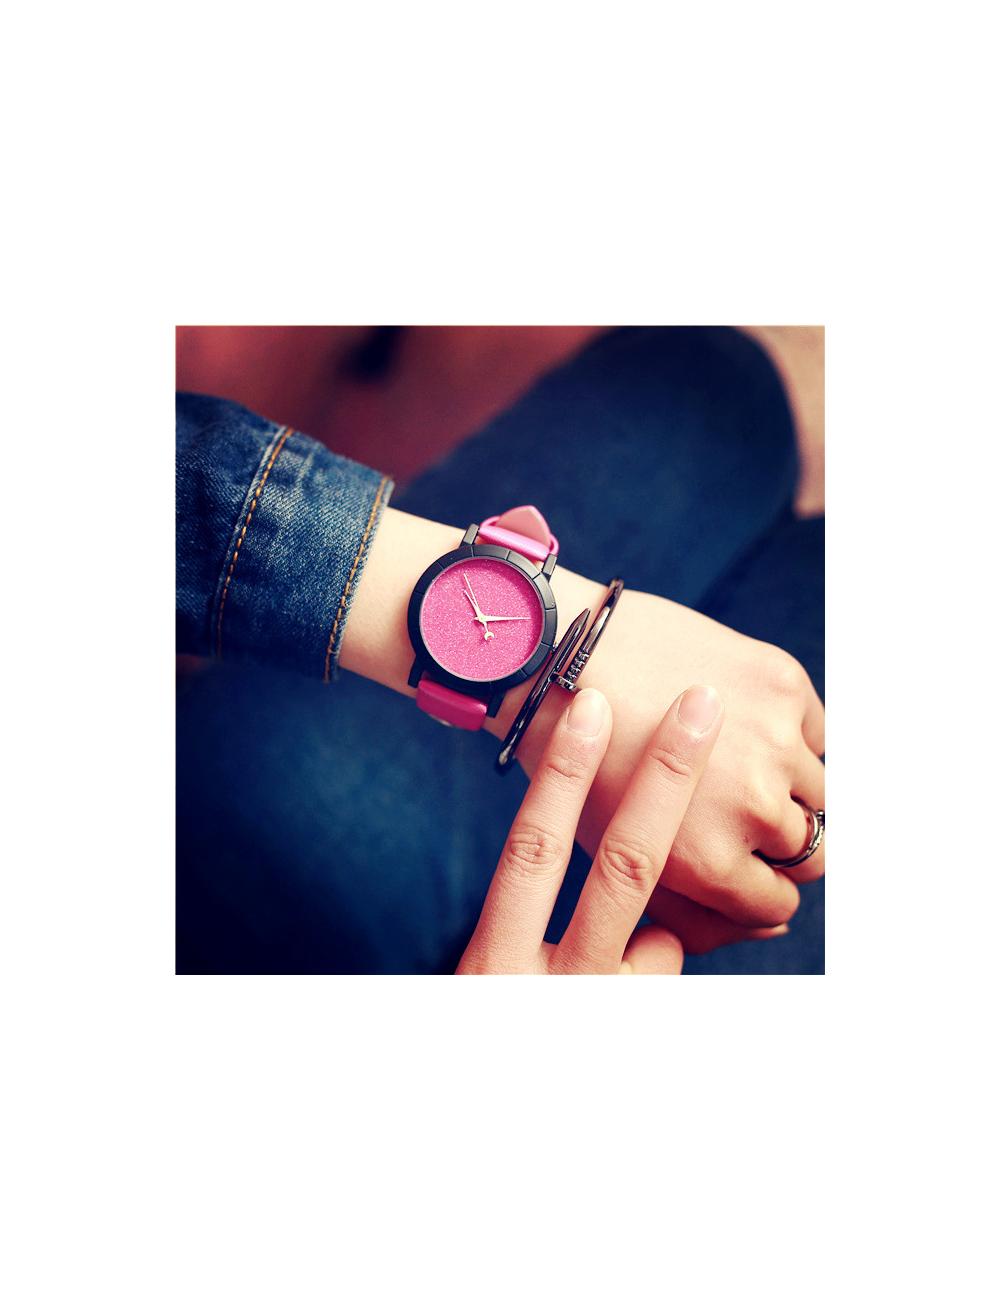 Reloj Escarchado Dayoshop 39,900.00